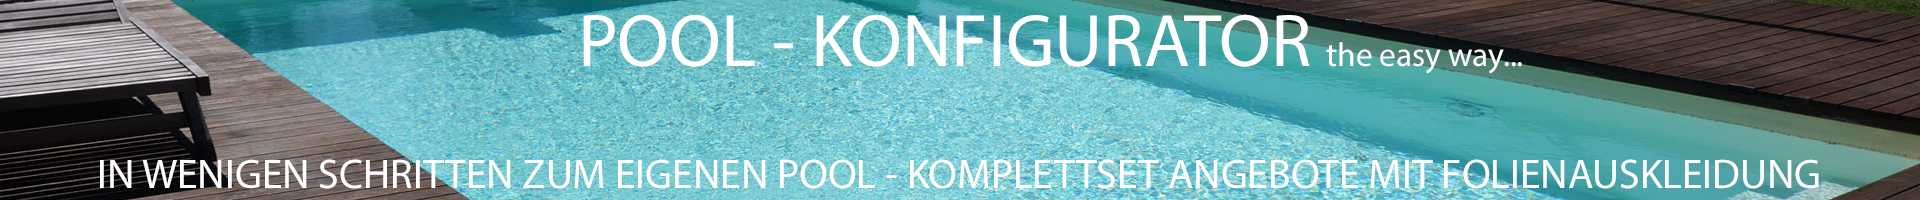 Konfigurator - Pool Komplettsets mit Folie und Technik